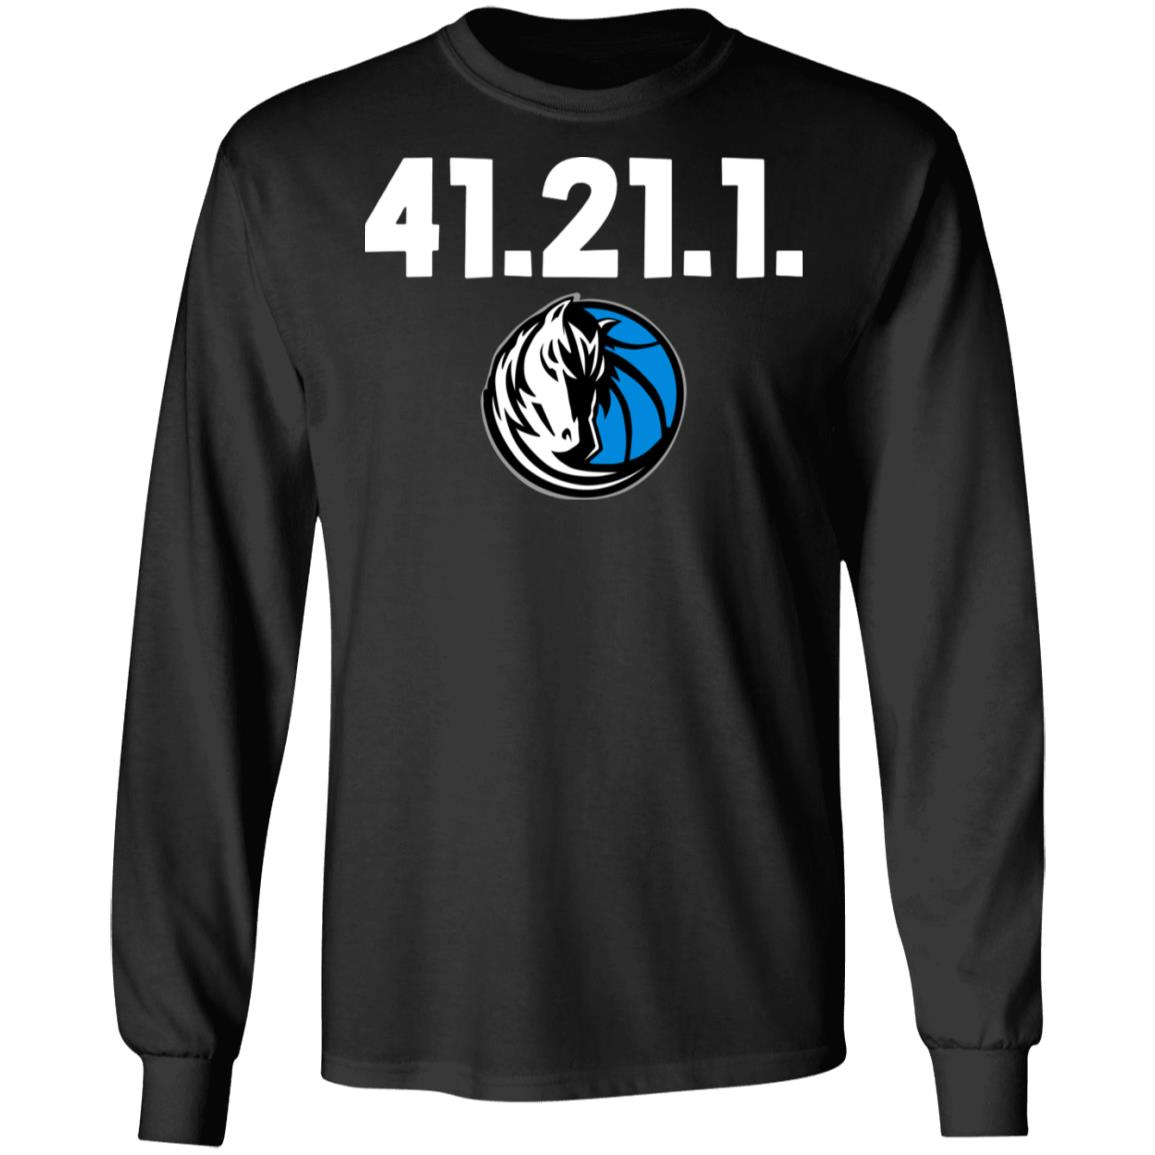 41.21.1 Dallas Mavericks Black T-shirt DIRK NOWITZKI Final Home Game Shirt